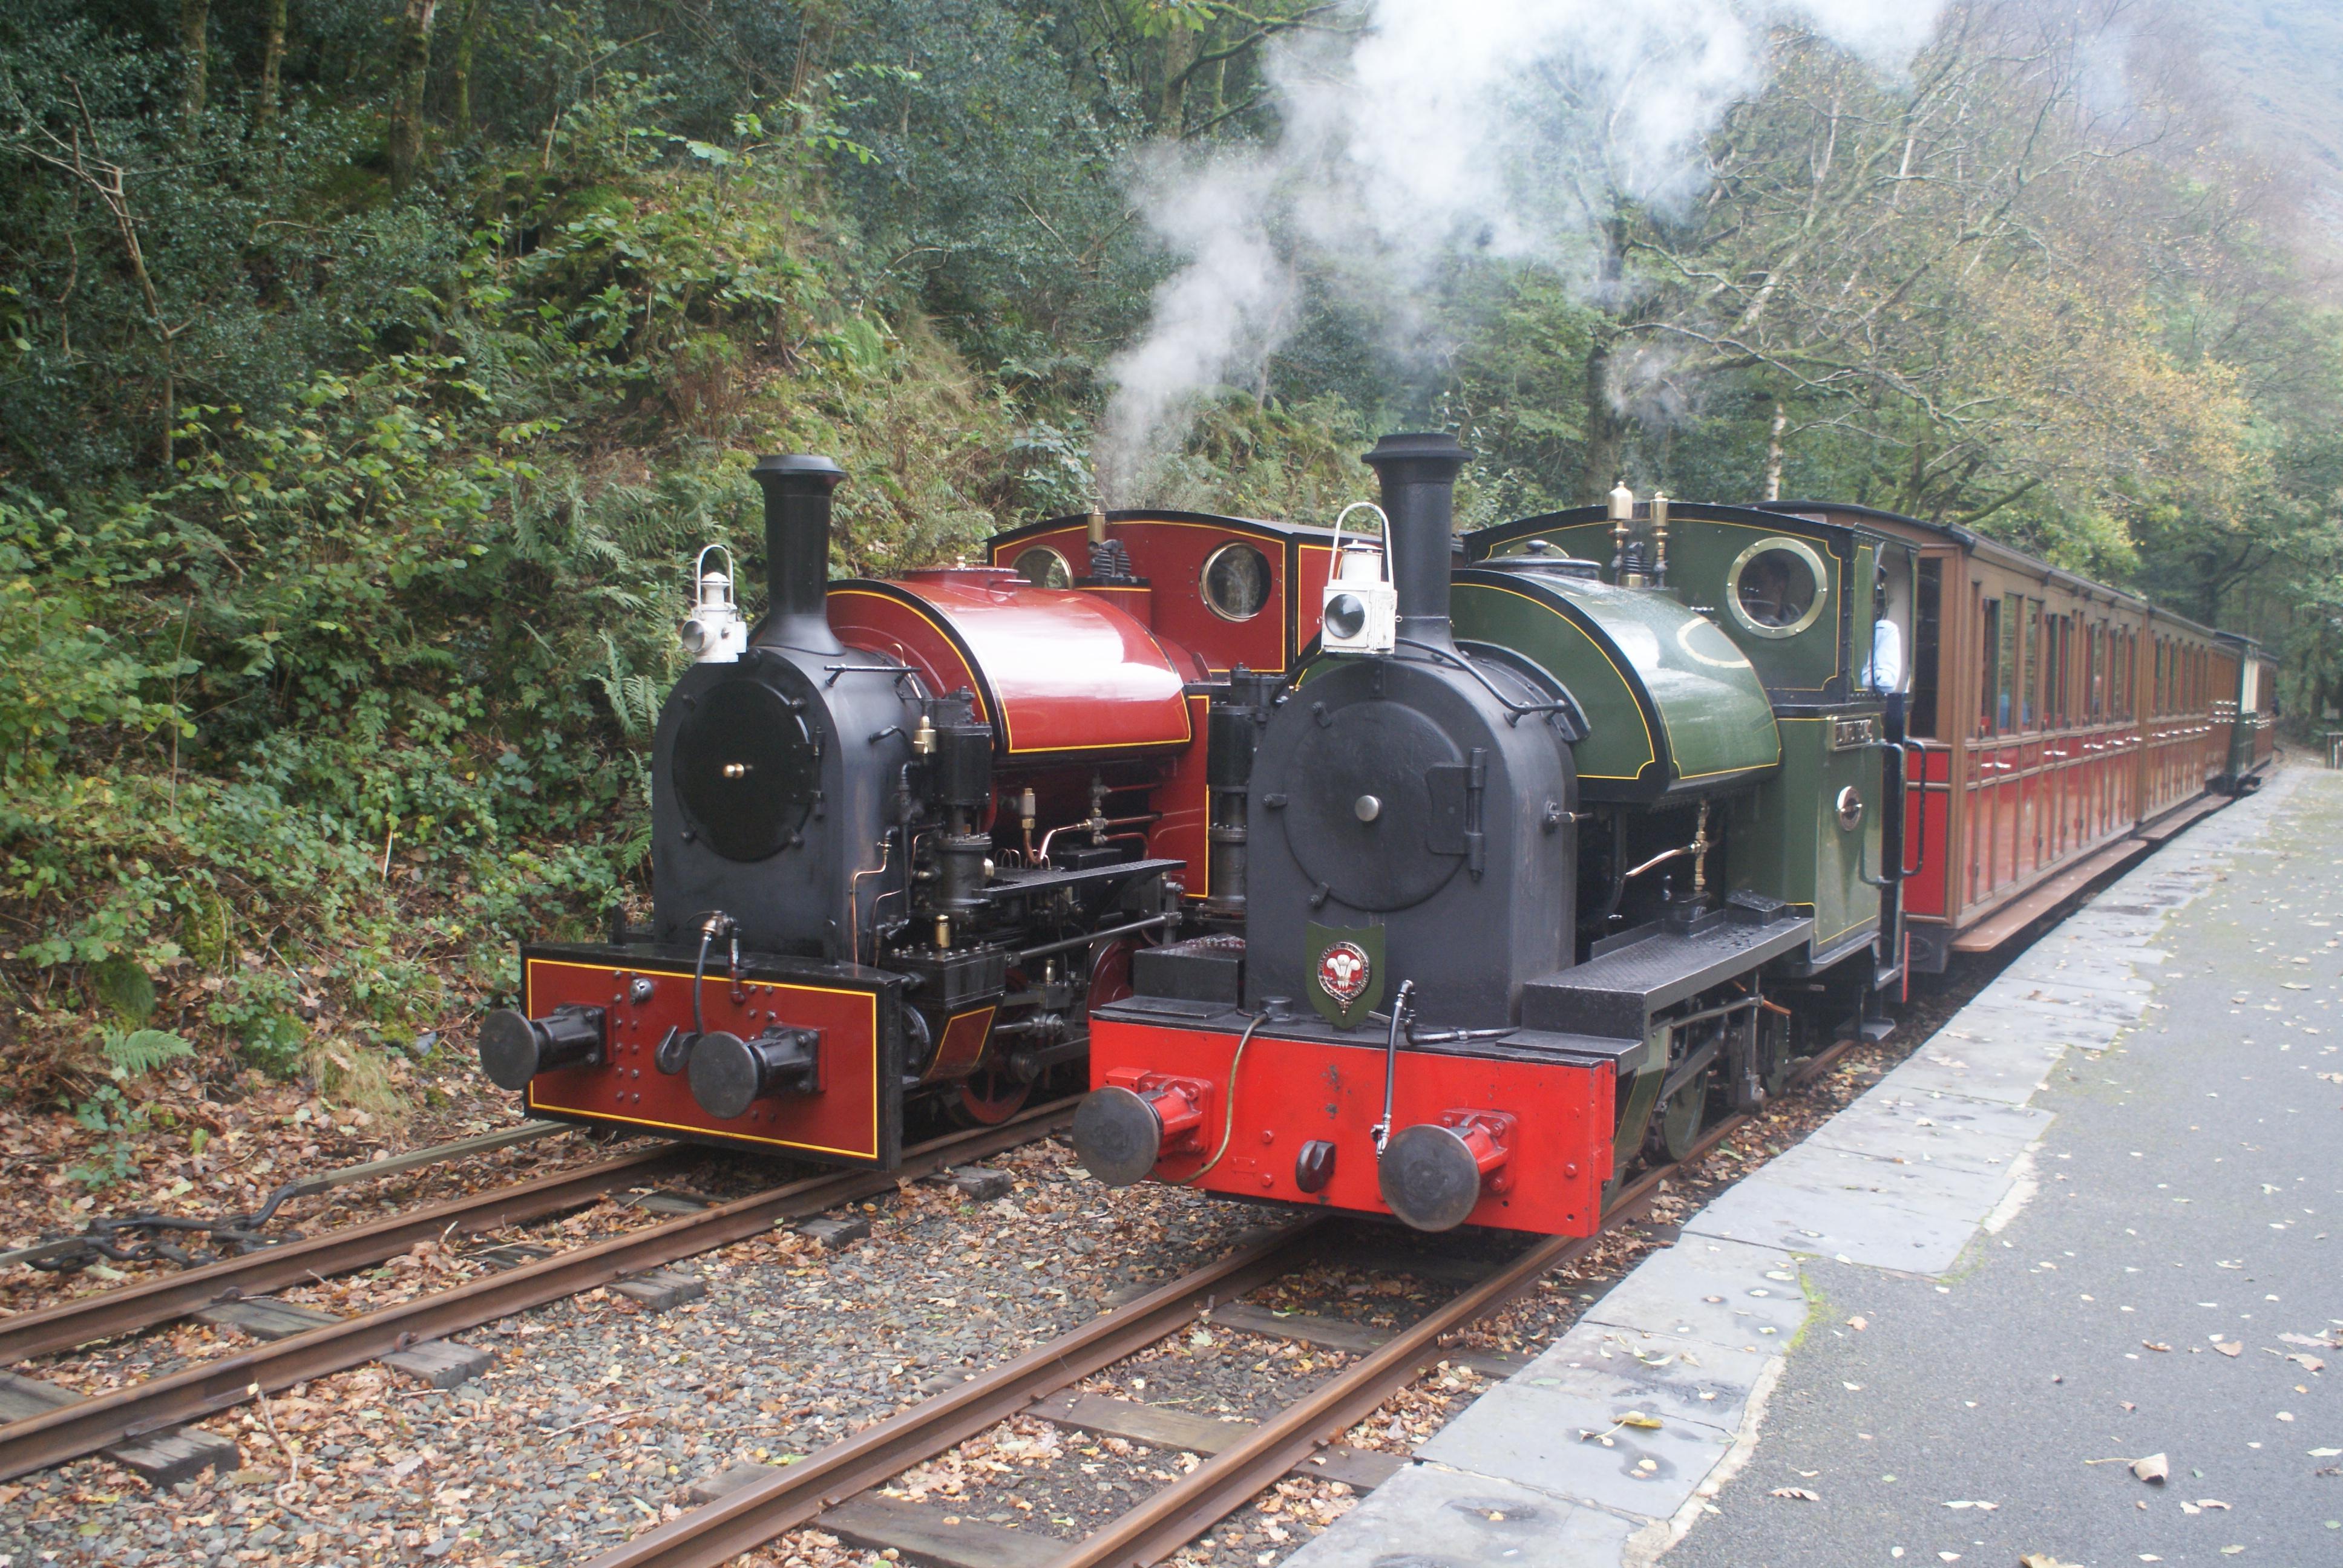 3 Esgairgeiliog Railway Station Photo Corris Machynlleth Corris Railway.